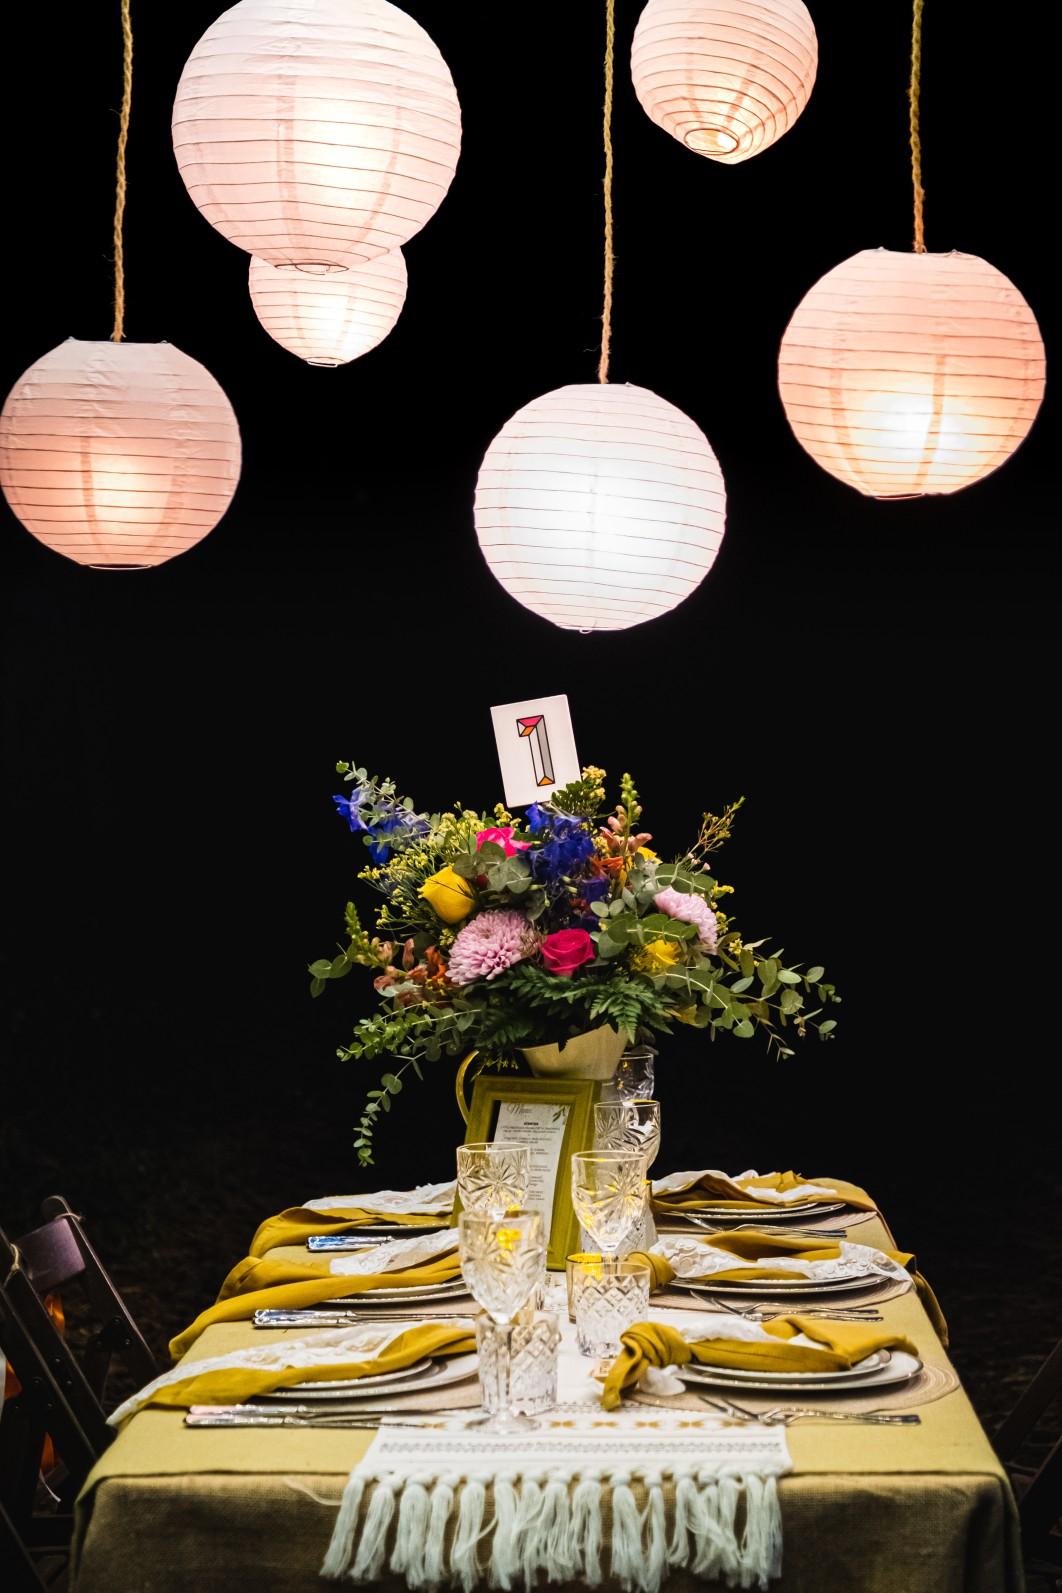 colourful micro wedding at patricks barn - unique wedding lighting - wedding handing lanterns - bohemian wedding